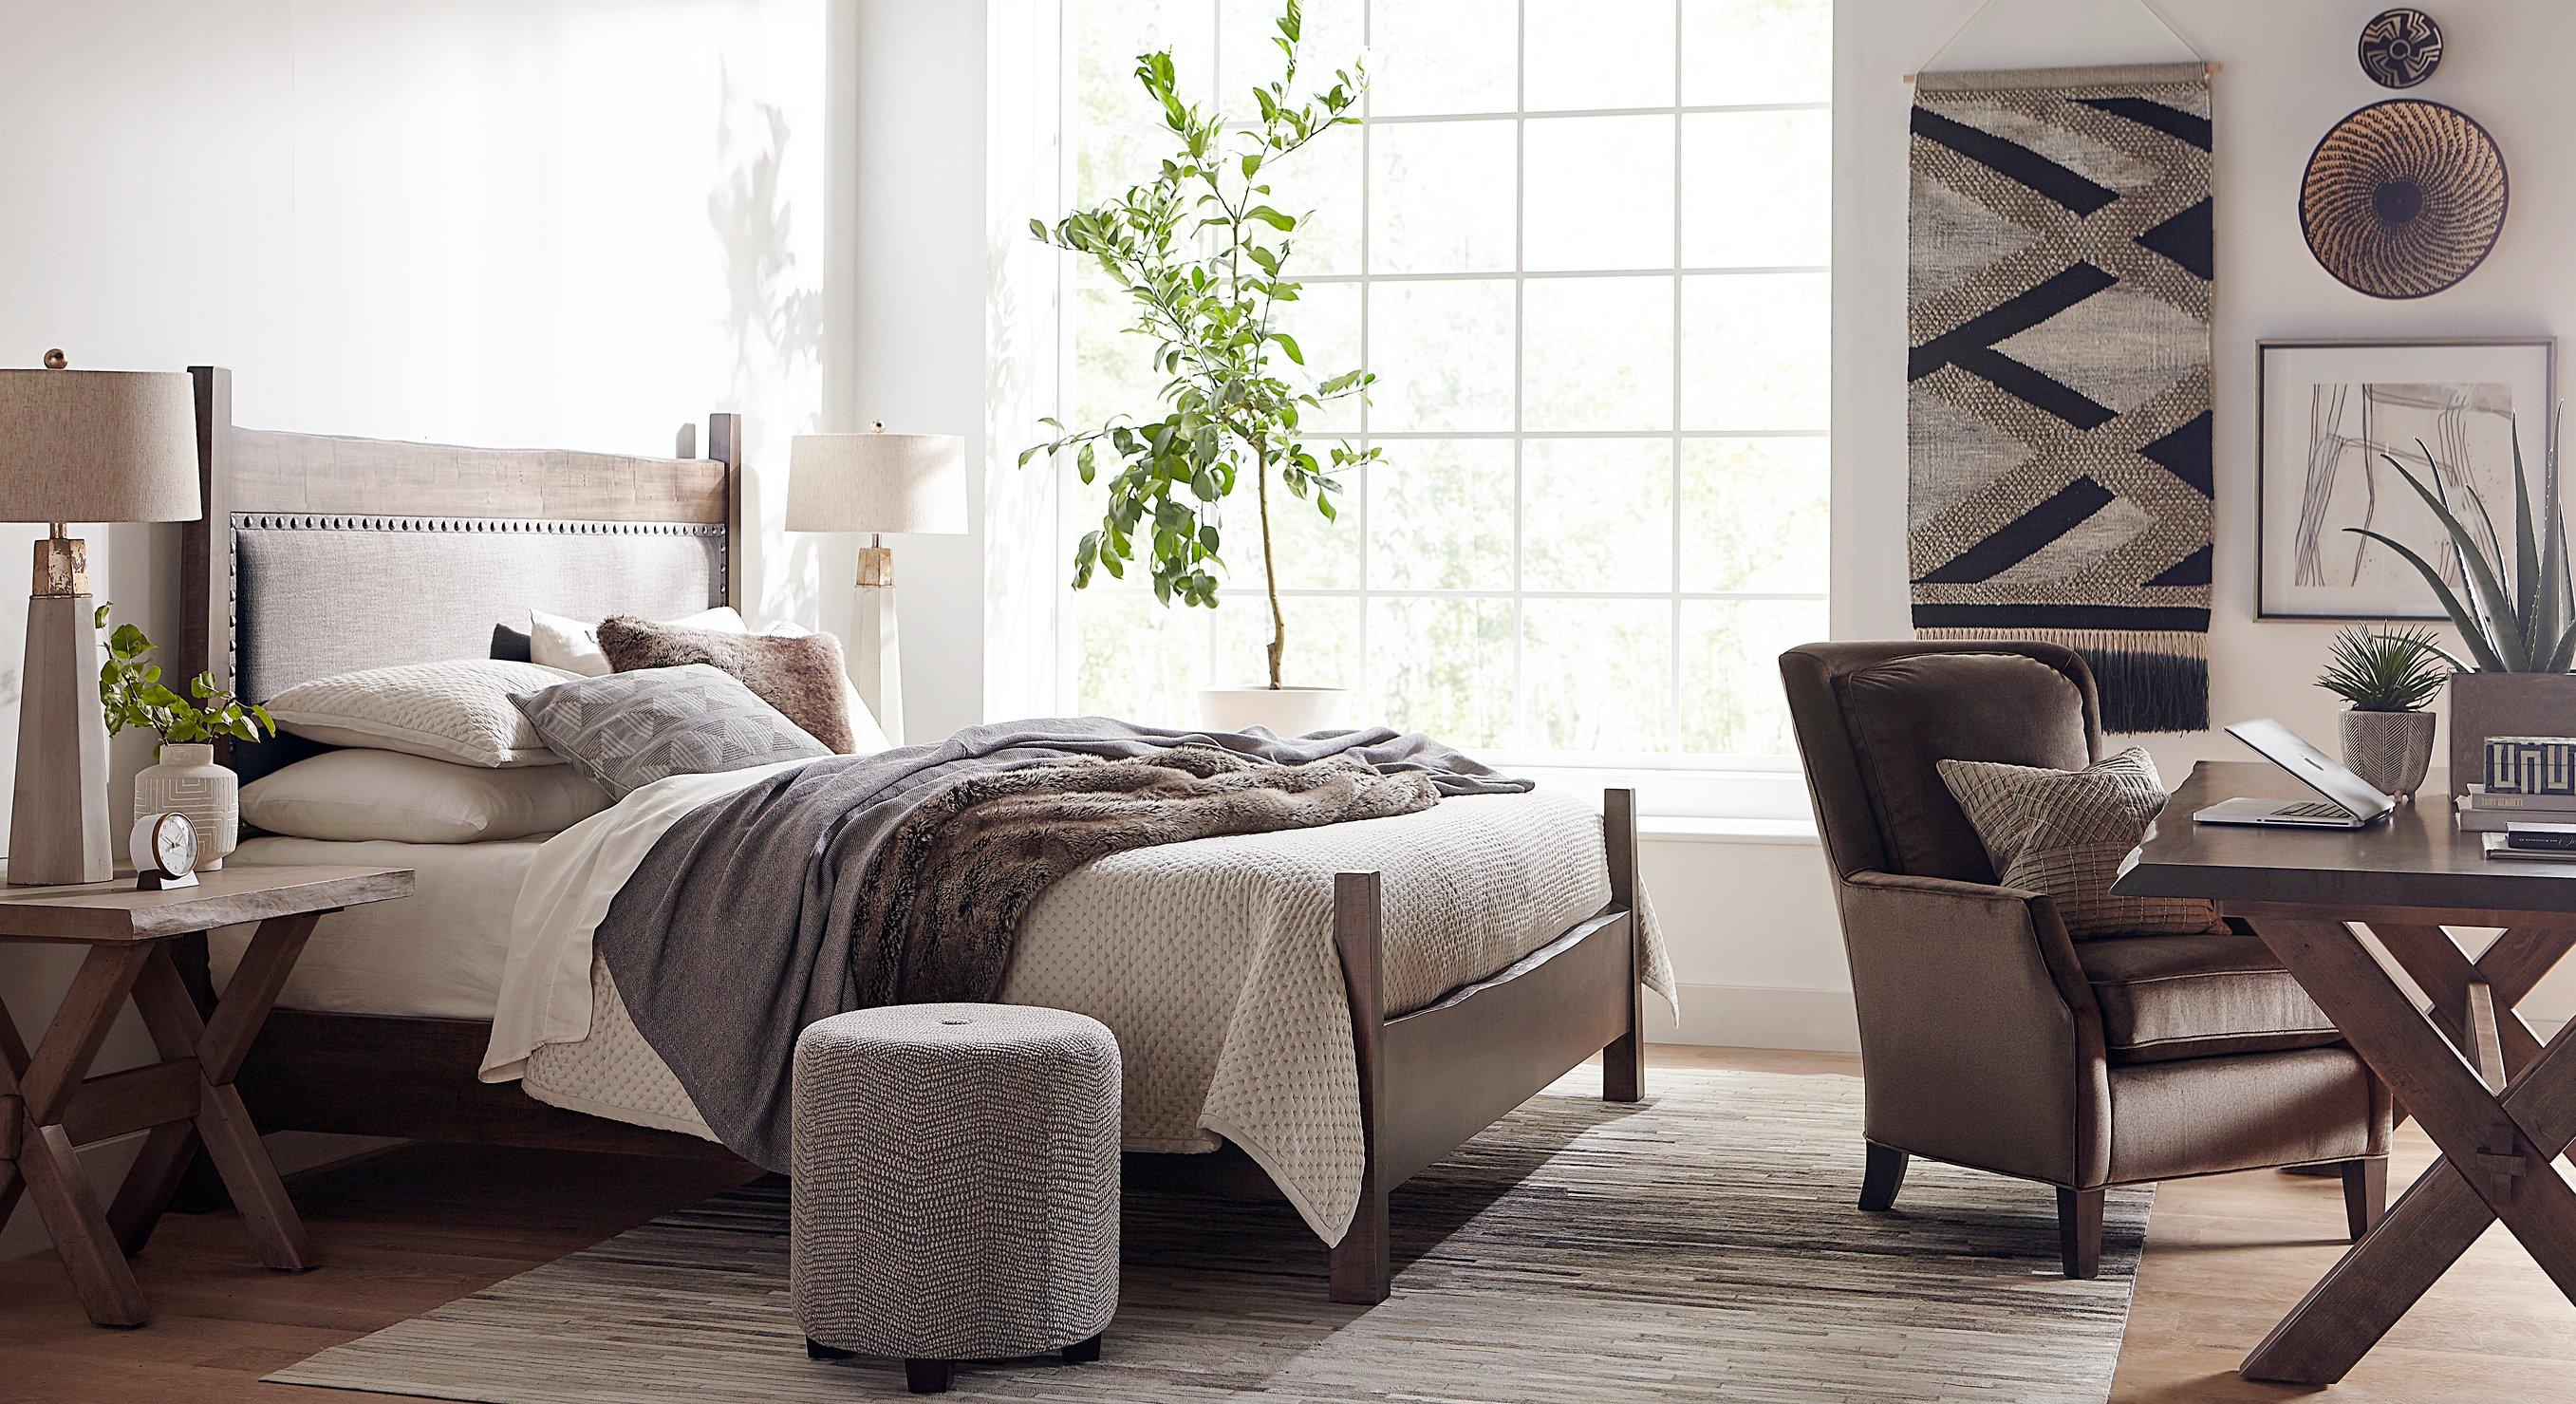 bedroom-scene-linen-neutrals-desk-chair-sunlight